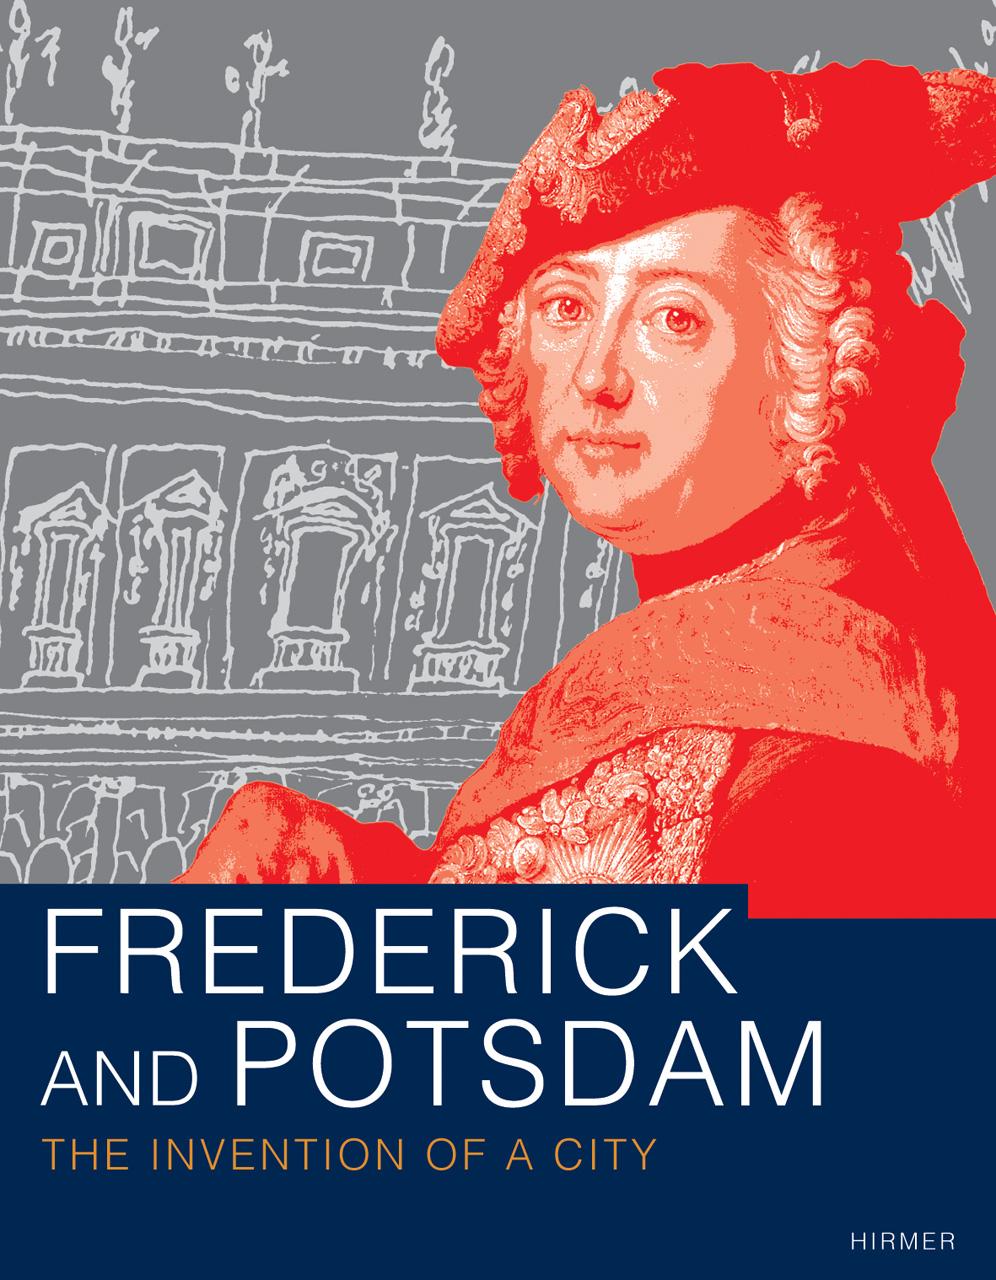 Frederick and Potsdam